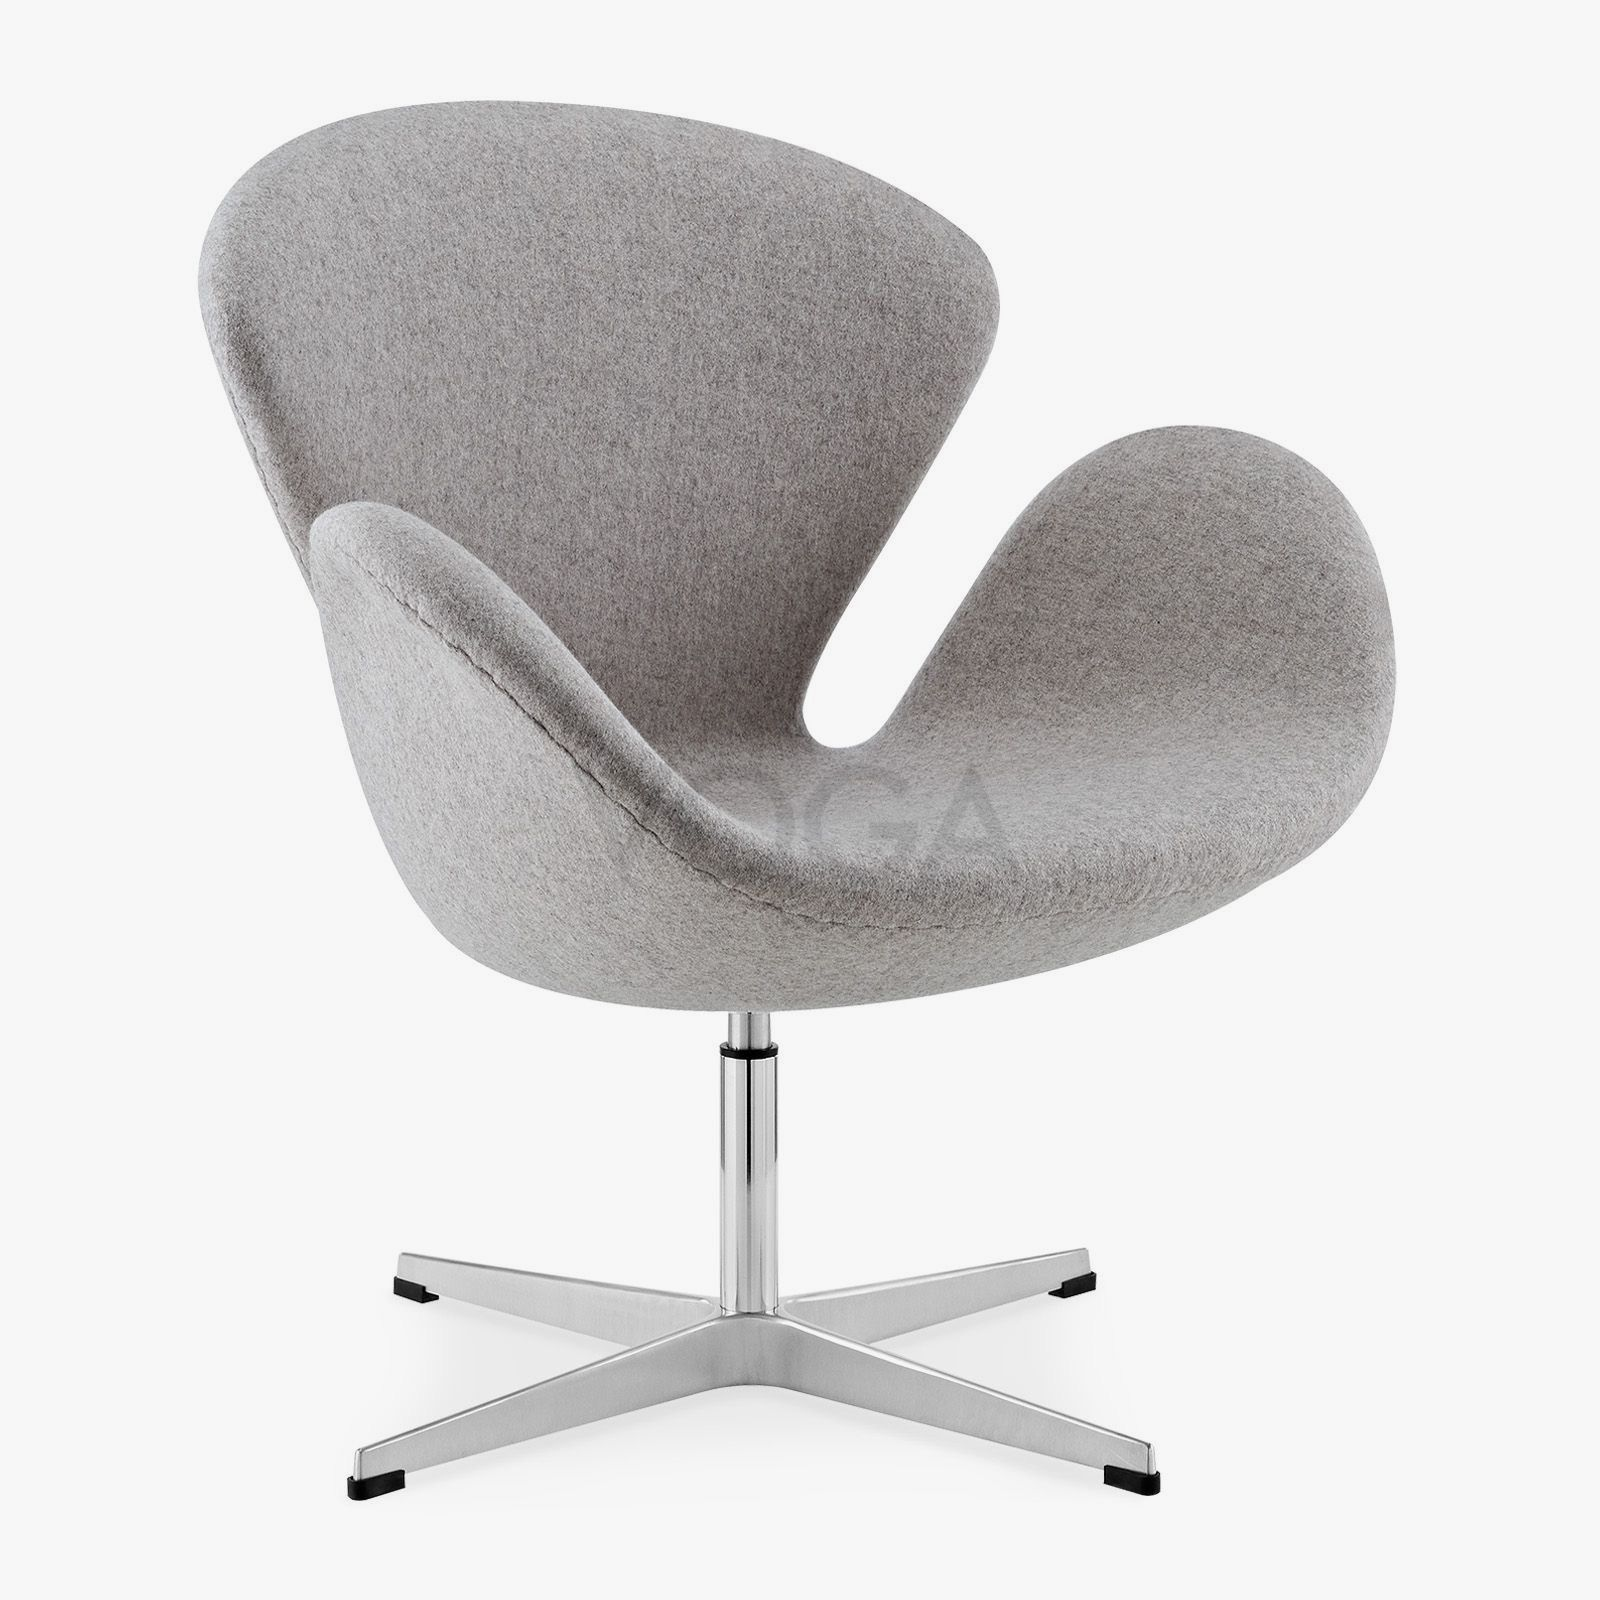 Hotel Collection Ladder Stitch: Swan Chair Jacobsen